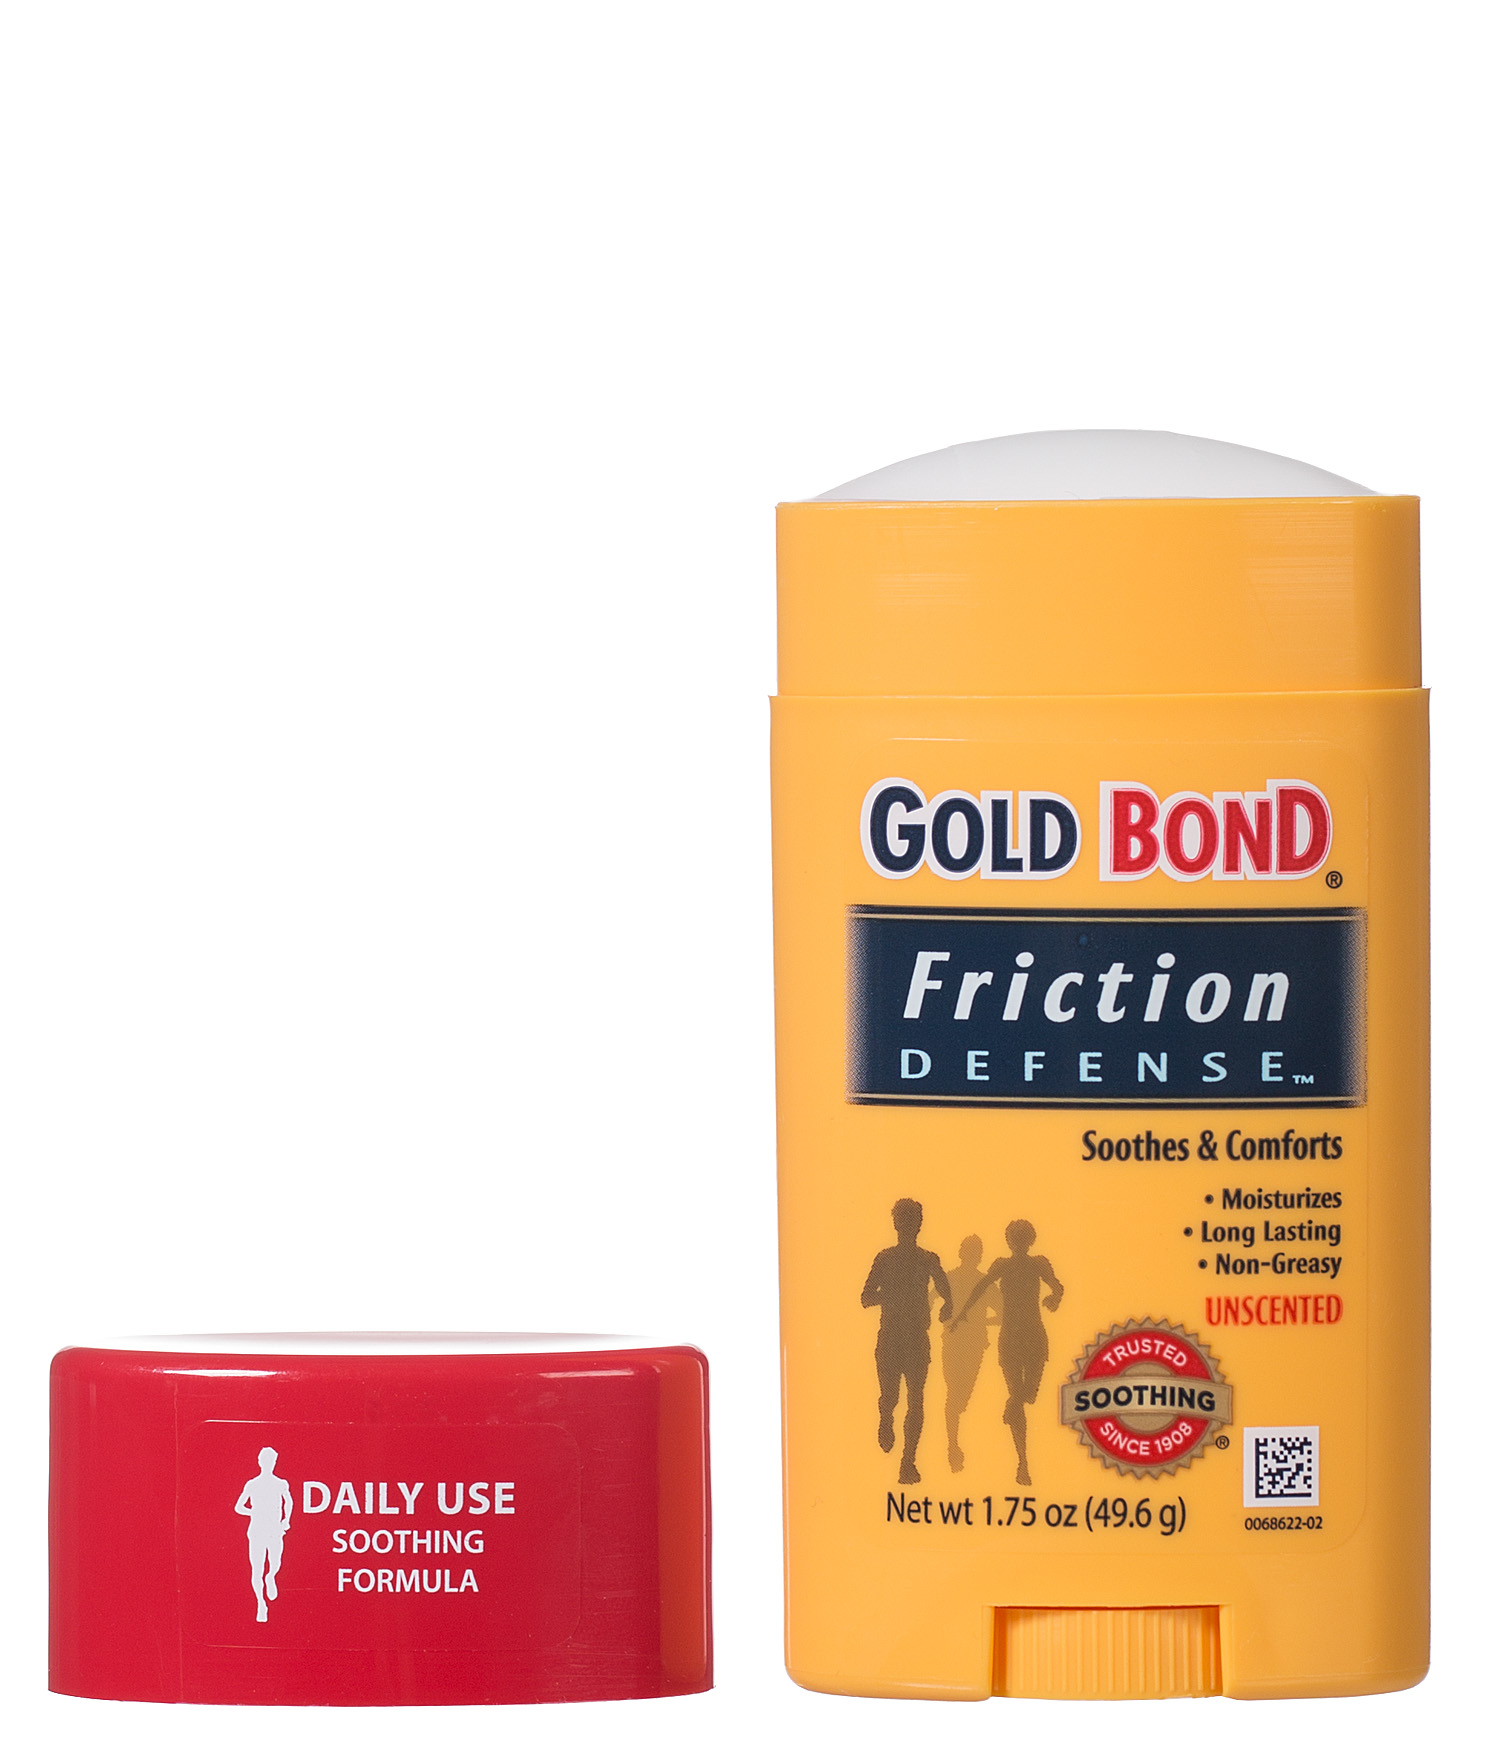 GOLD BOND Friction Defense, 1 75oz - Walmart com